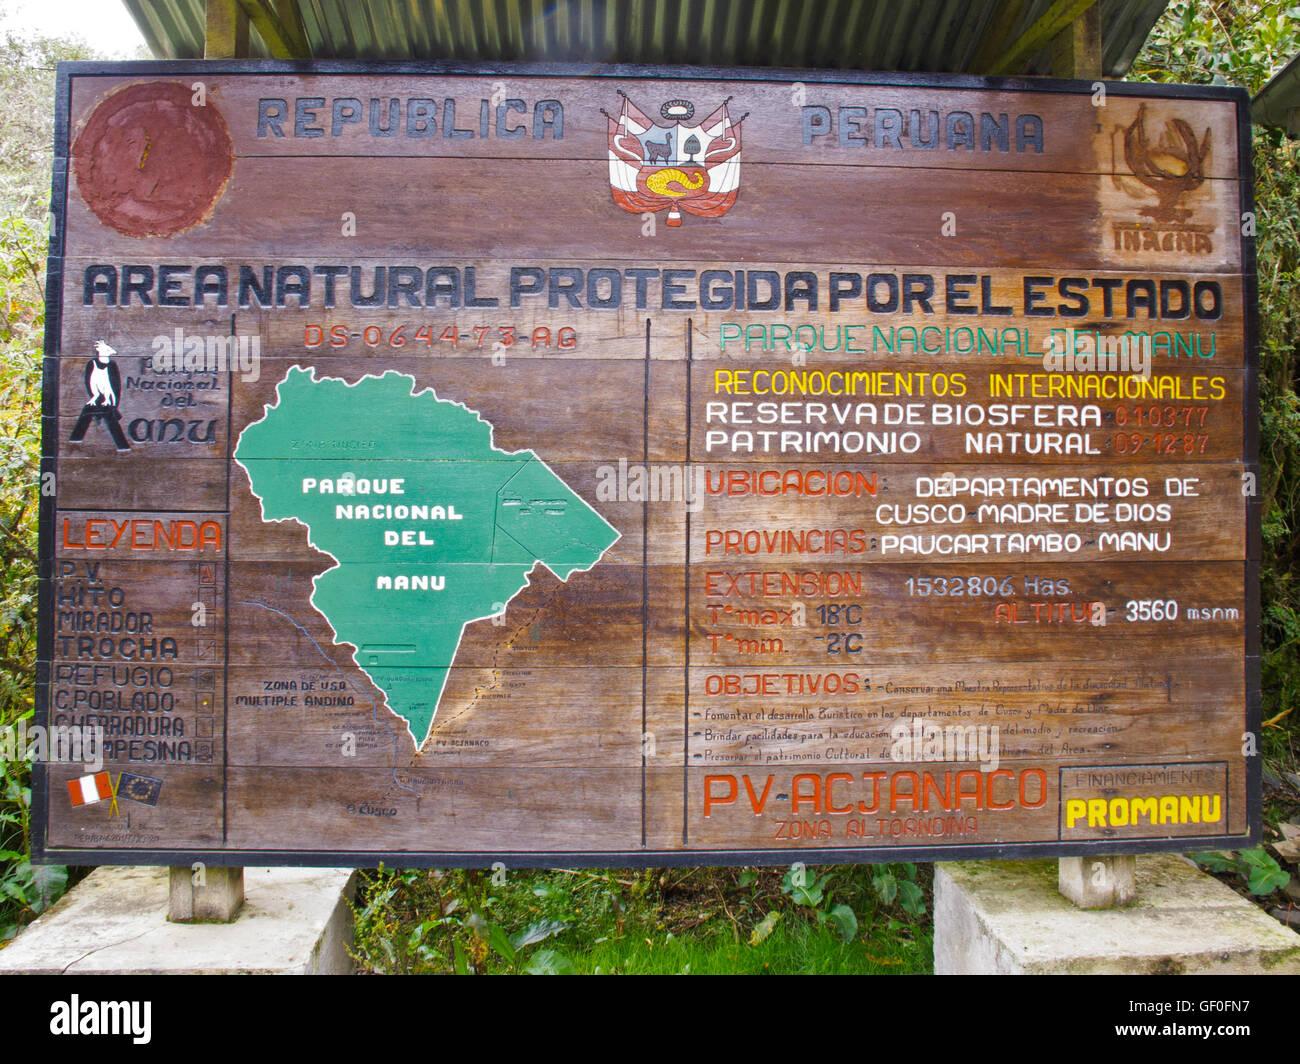 The sign at the entrance of Manu National Park, Peru. - Stock Image